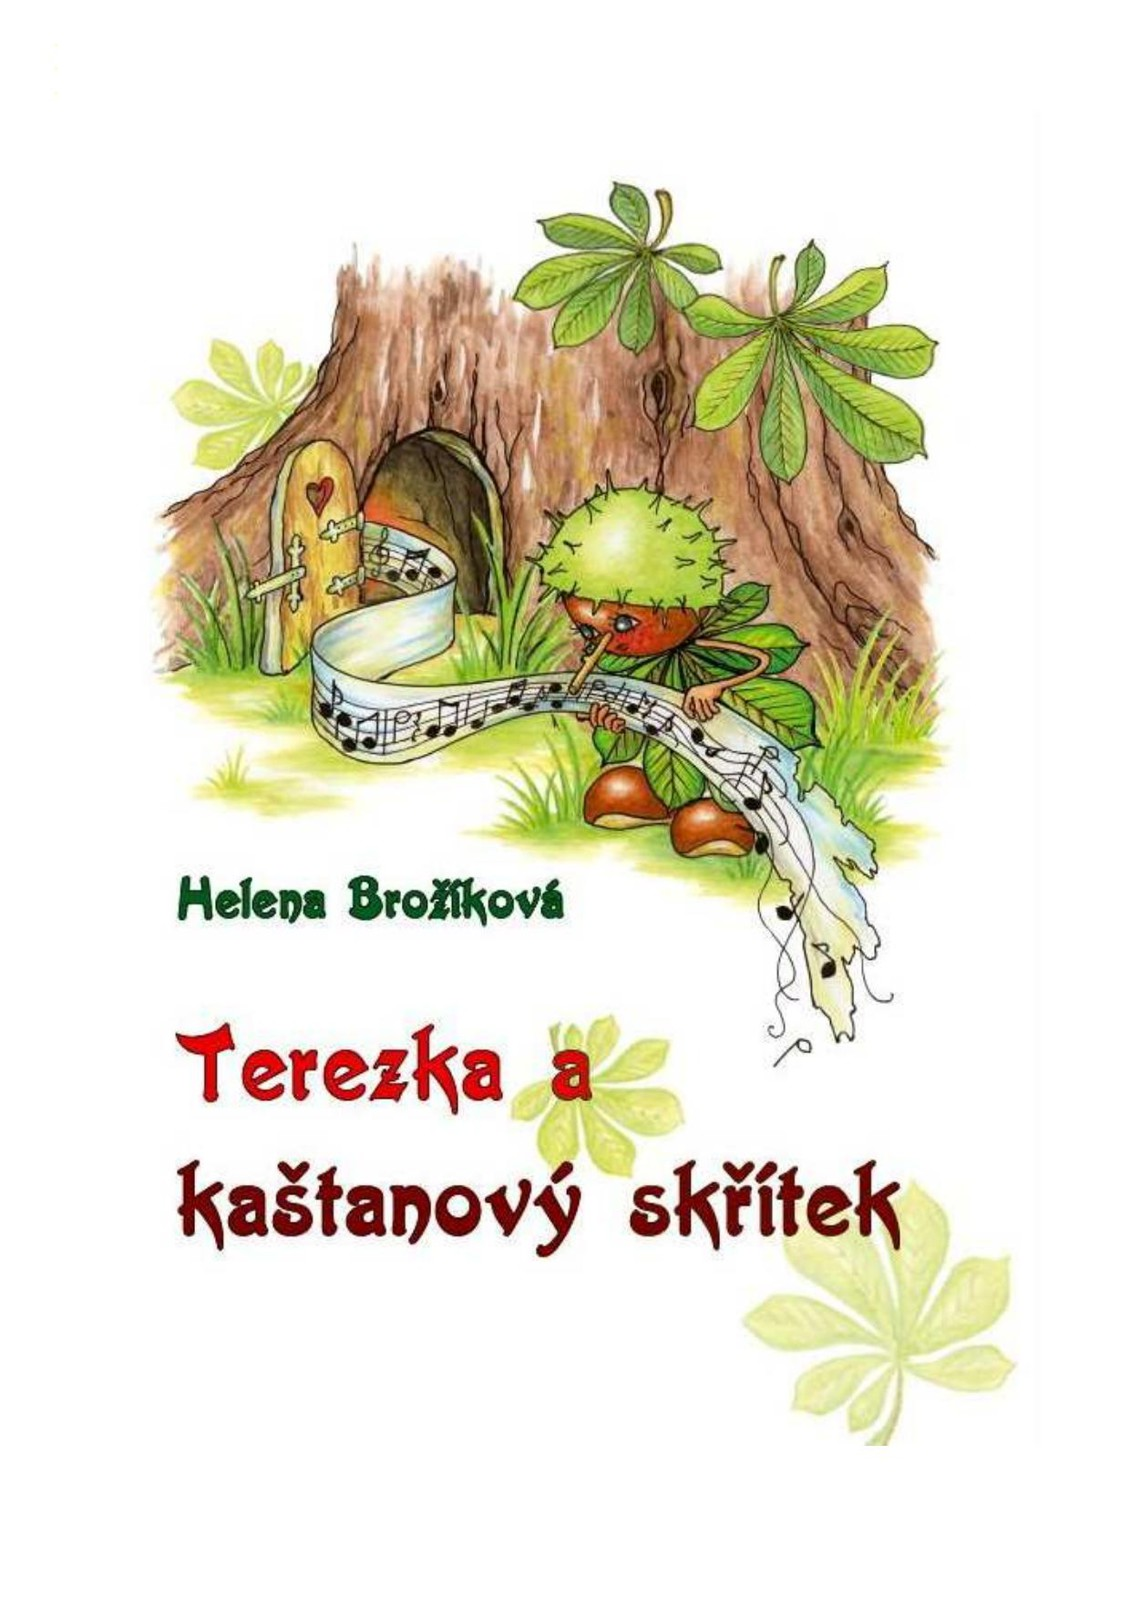 media/covers/3/7/91/Terezka-a-kastanovy-skritek.jpg